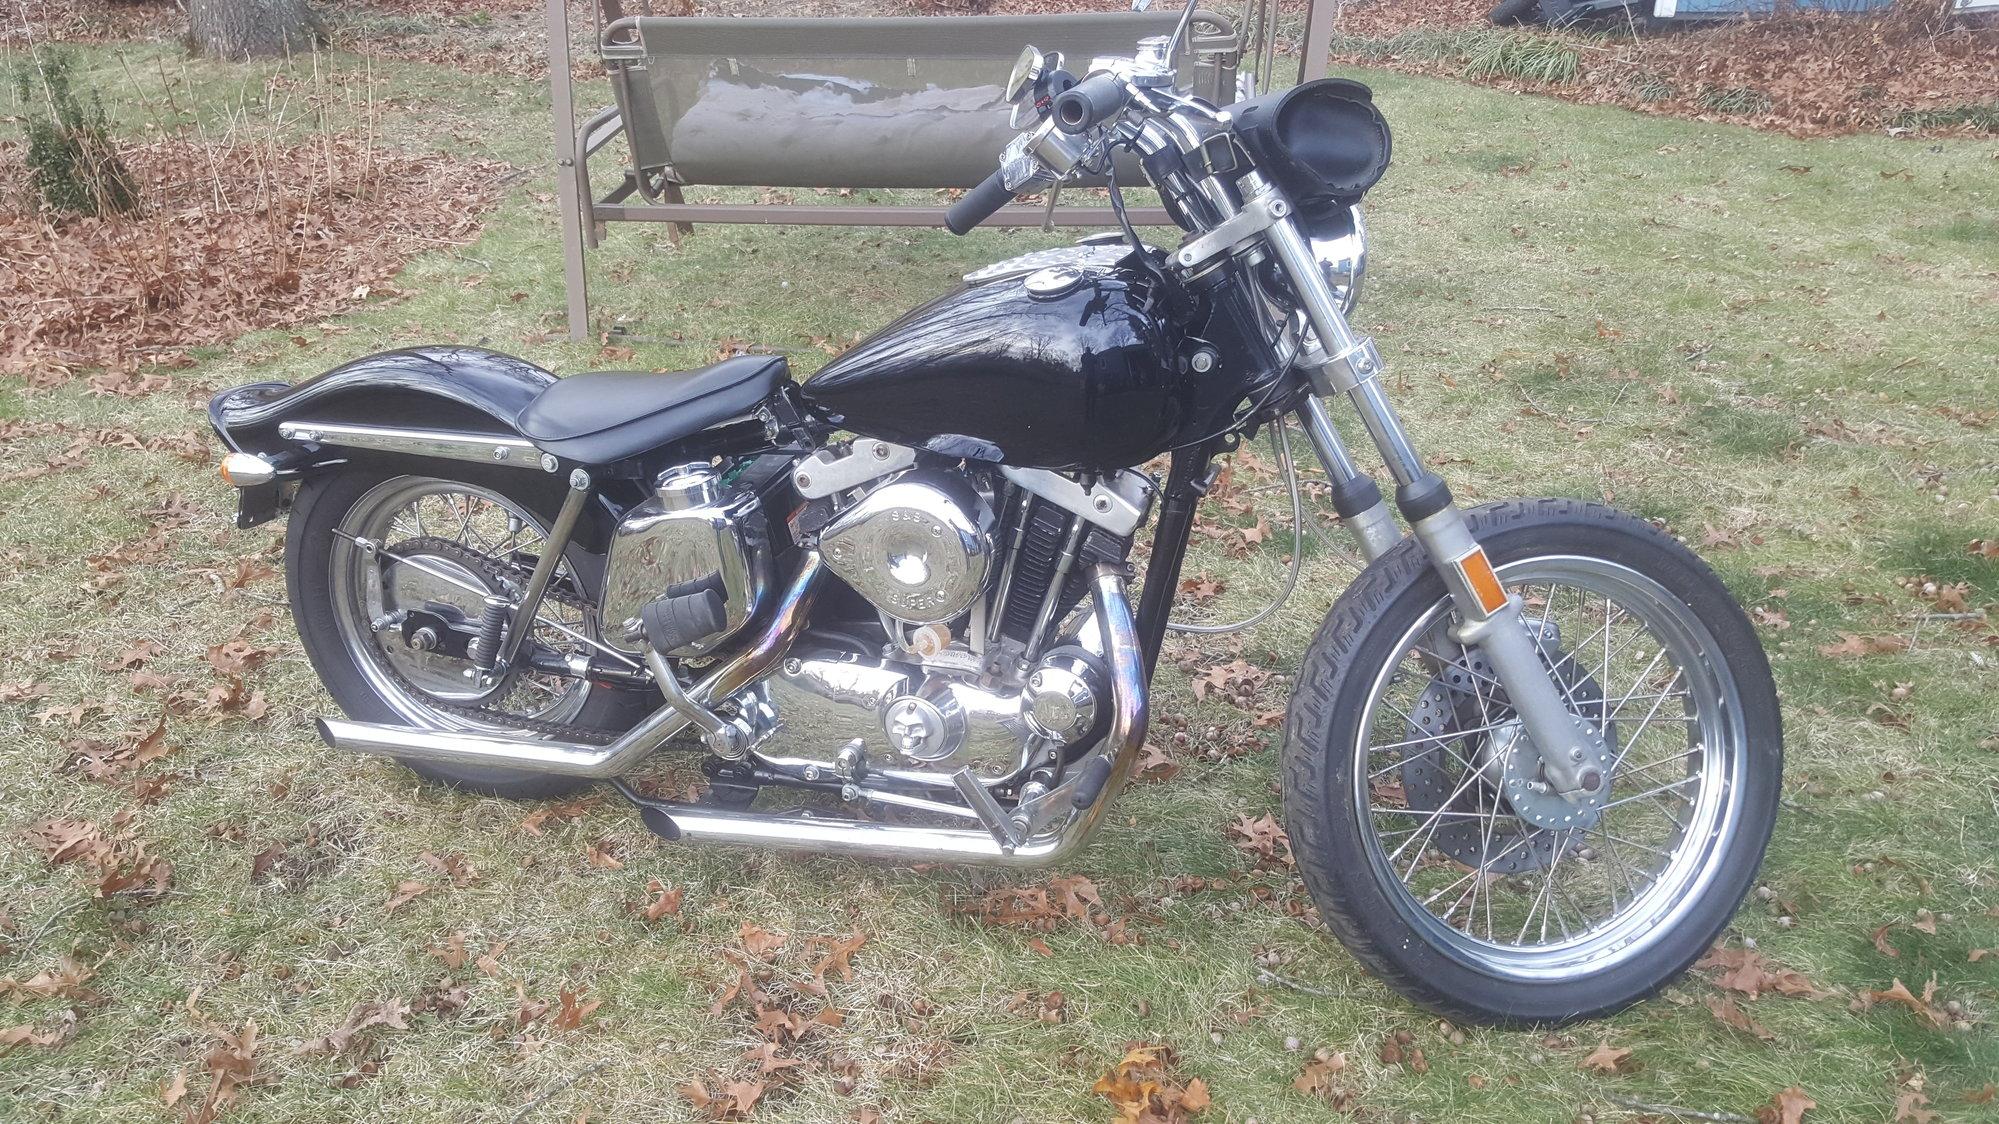 74 ironhead no spark - Harley Davidson Forums